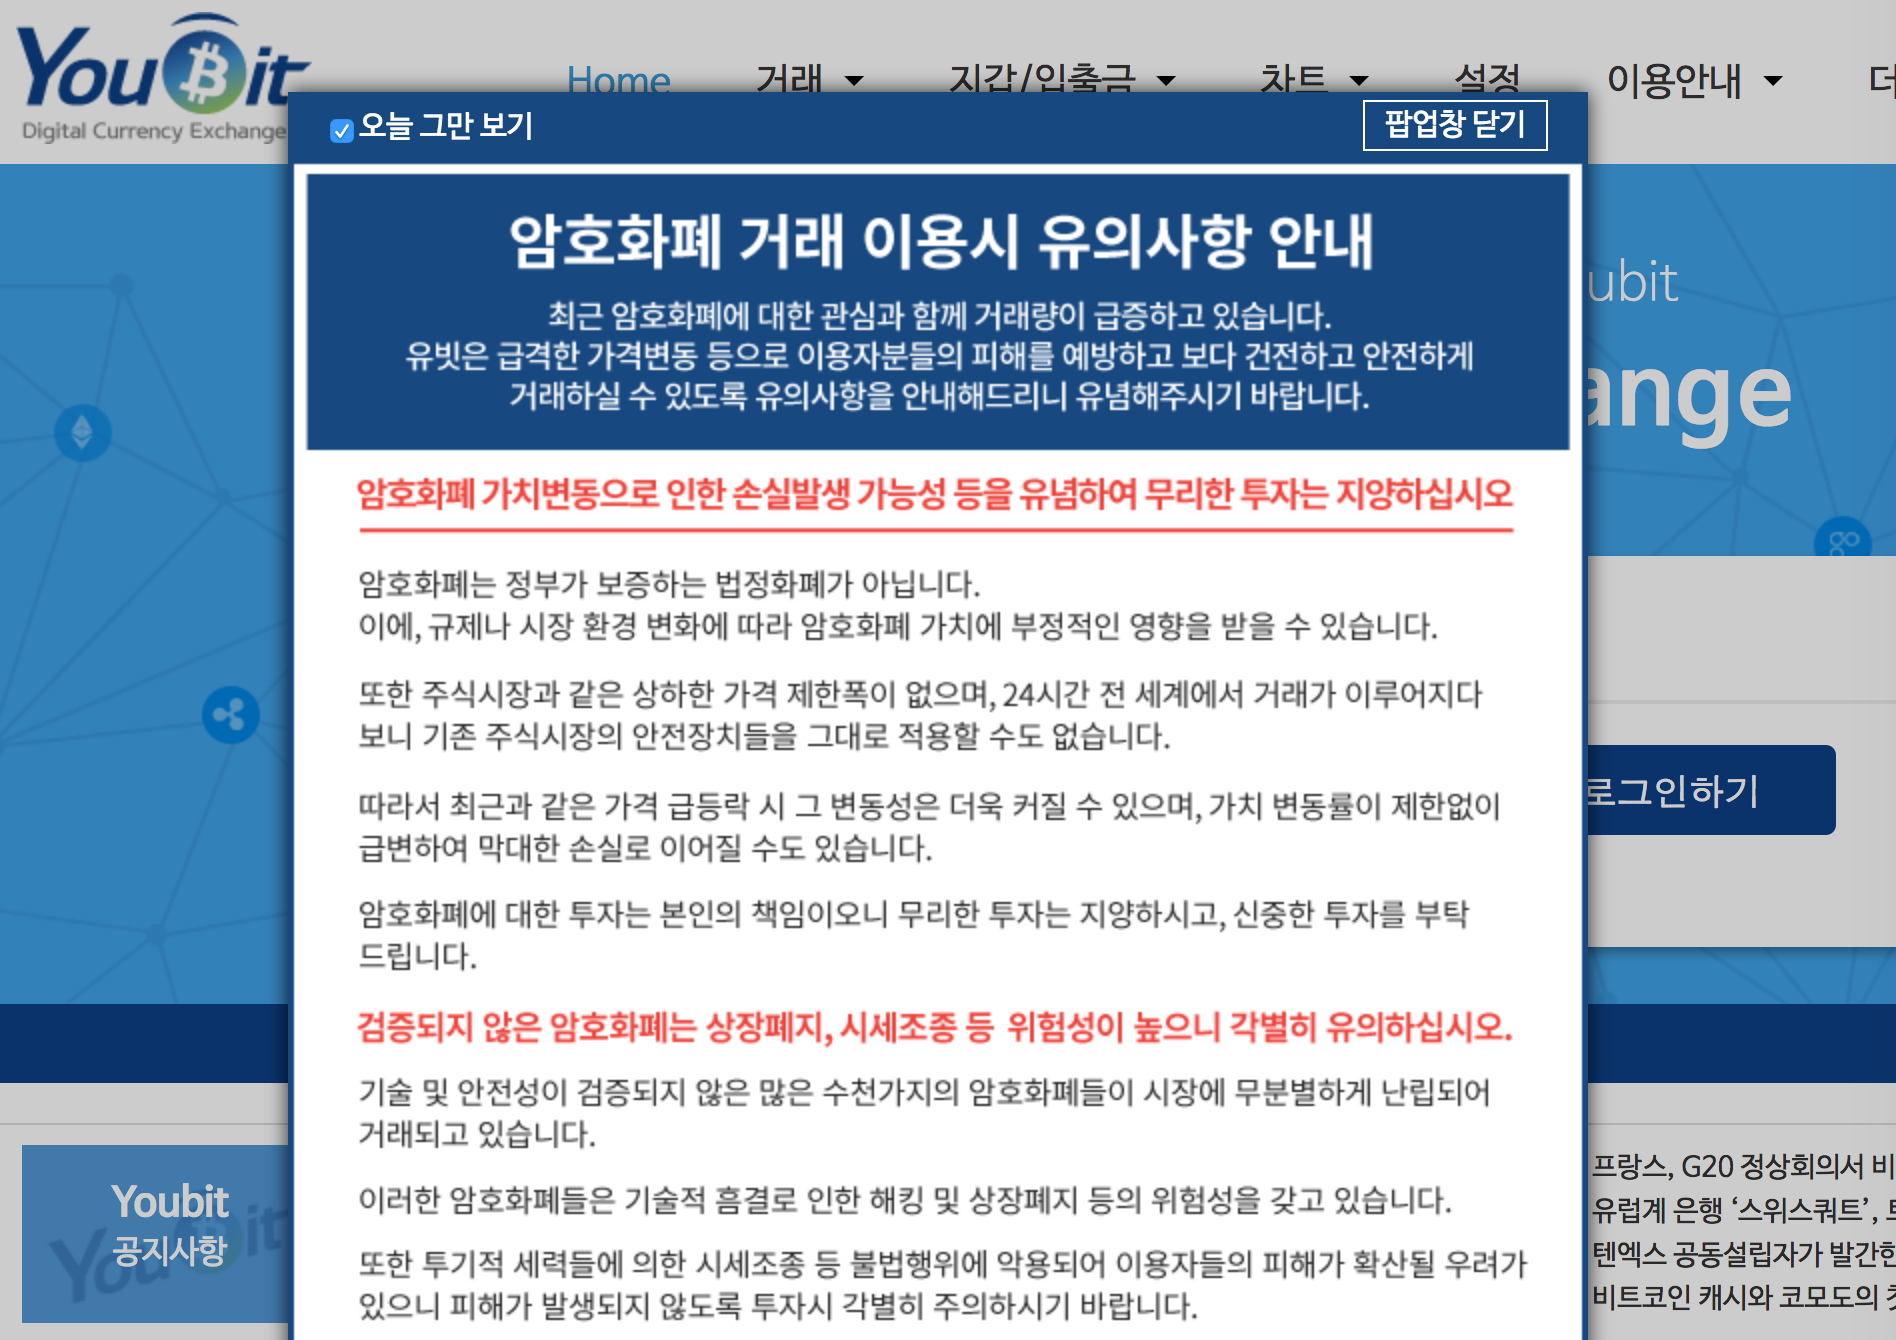 【Gox速報】韓国の仮想通貨取引所「Youbit」が破産申請。北朝鮮にビットコインを盗まれてコメントコメントする